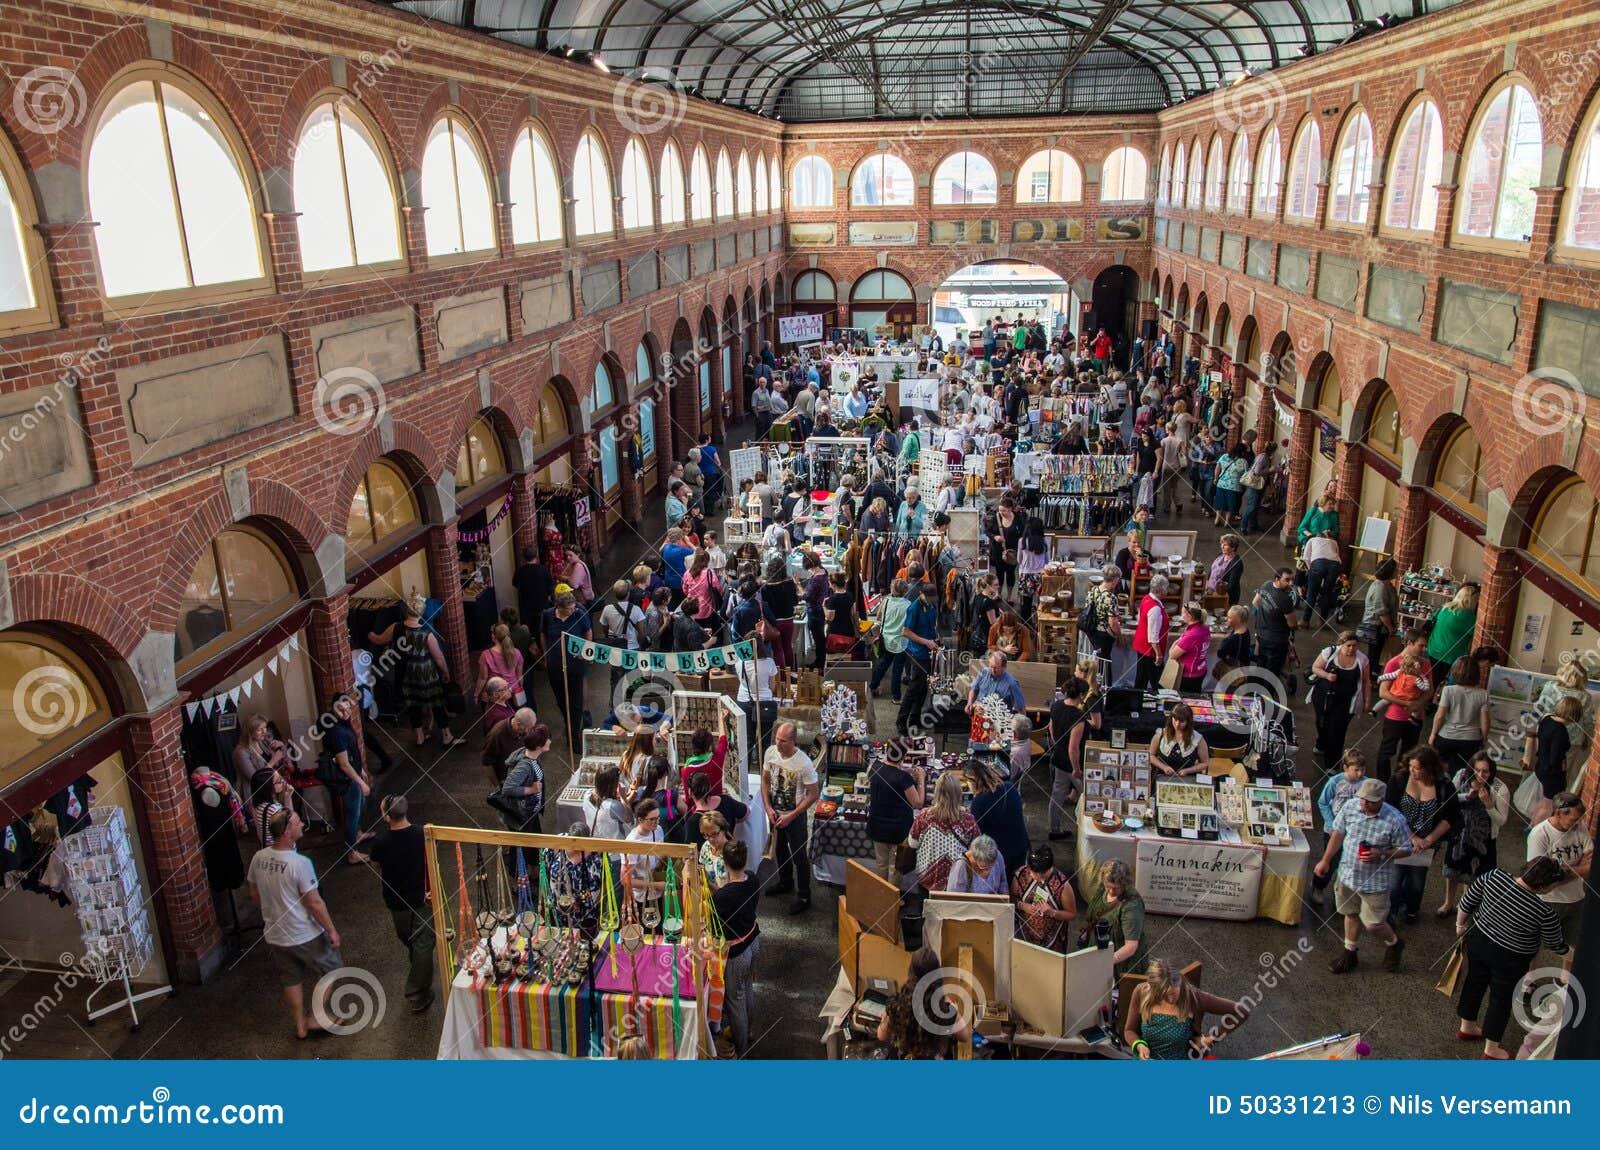 Market or exchange